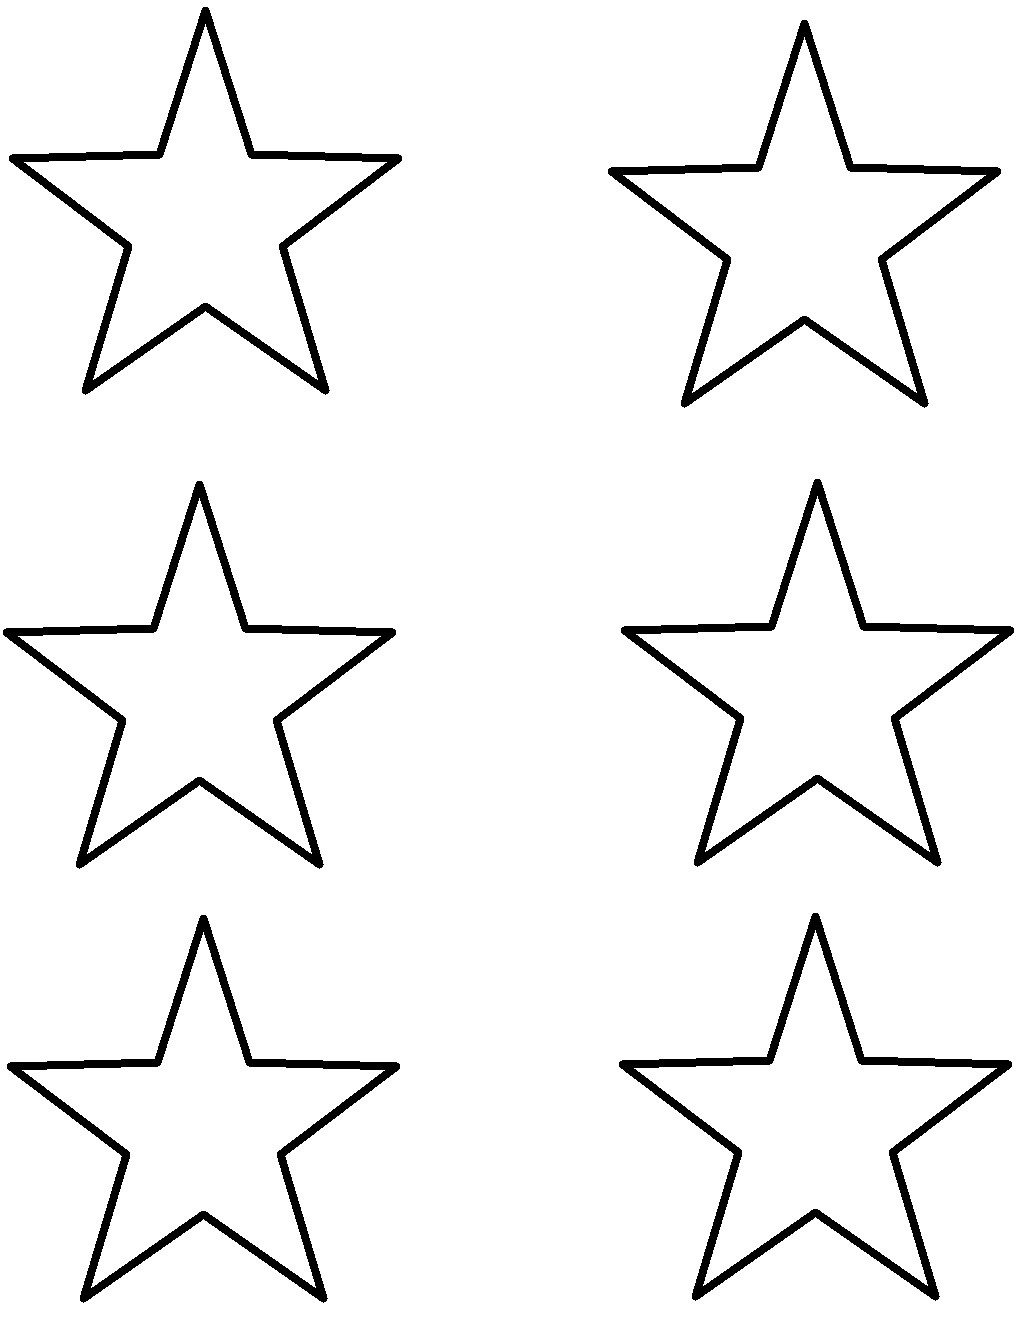 WriteShop Level B Printables Homeschooling 6